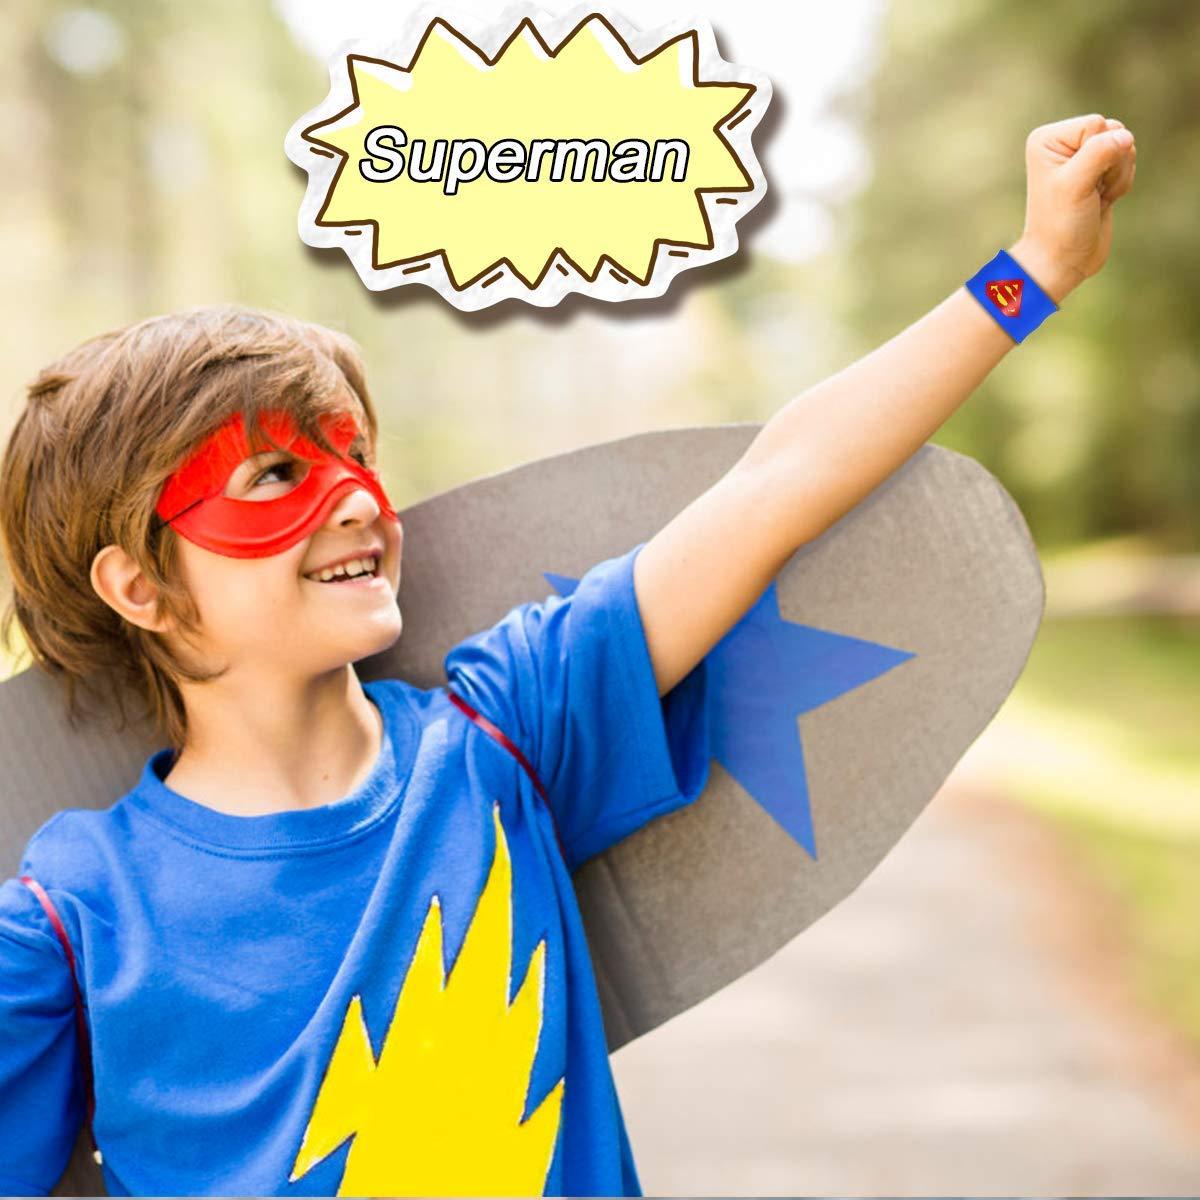 POKONBOY Superhero Slap Bracelets for Kids Party favors - 24 Pack Slap Bracelets for Boys Girls Kids Super Hero Birthday Party Favors Supplies Carnival Boys Prizes by POKONBOY (Image #7)